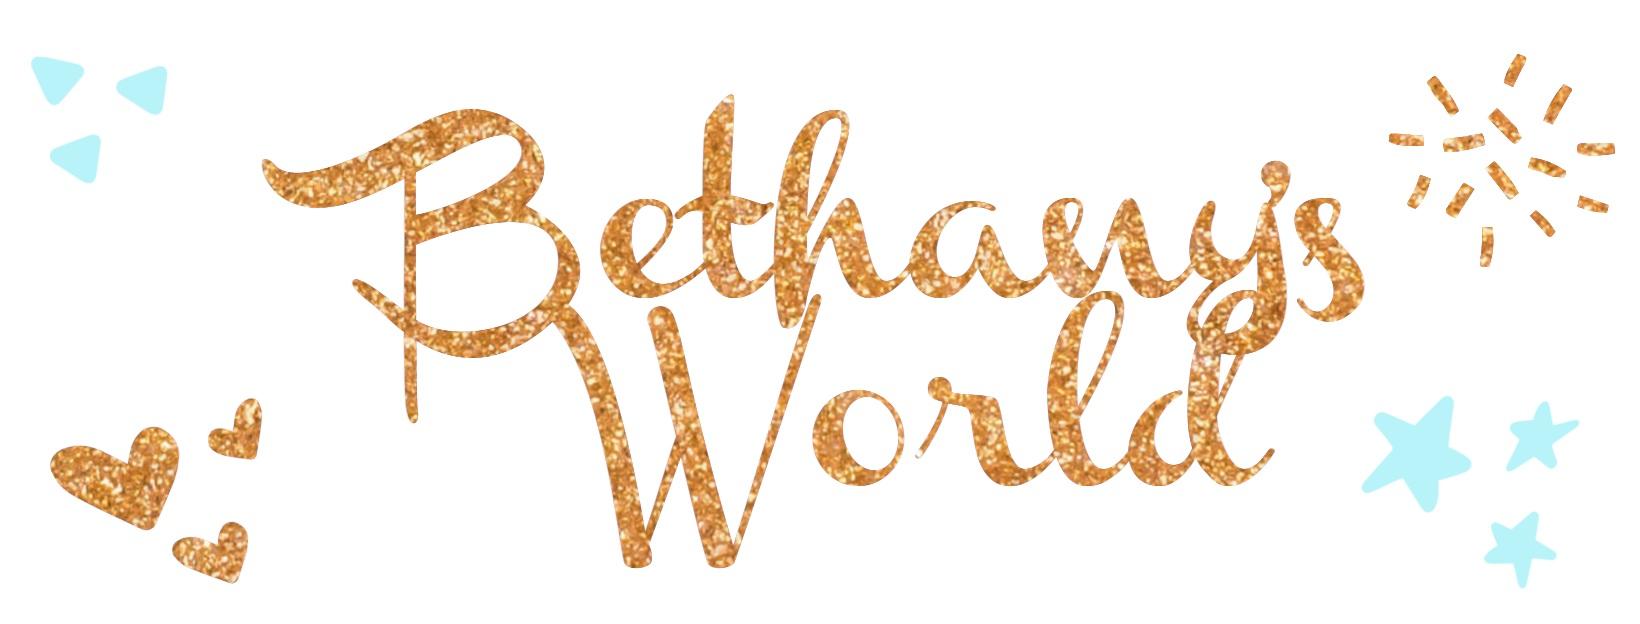 Bethany+glitter.jpg